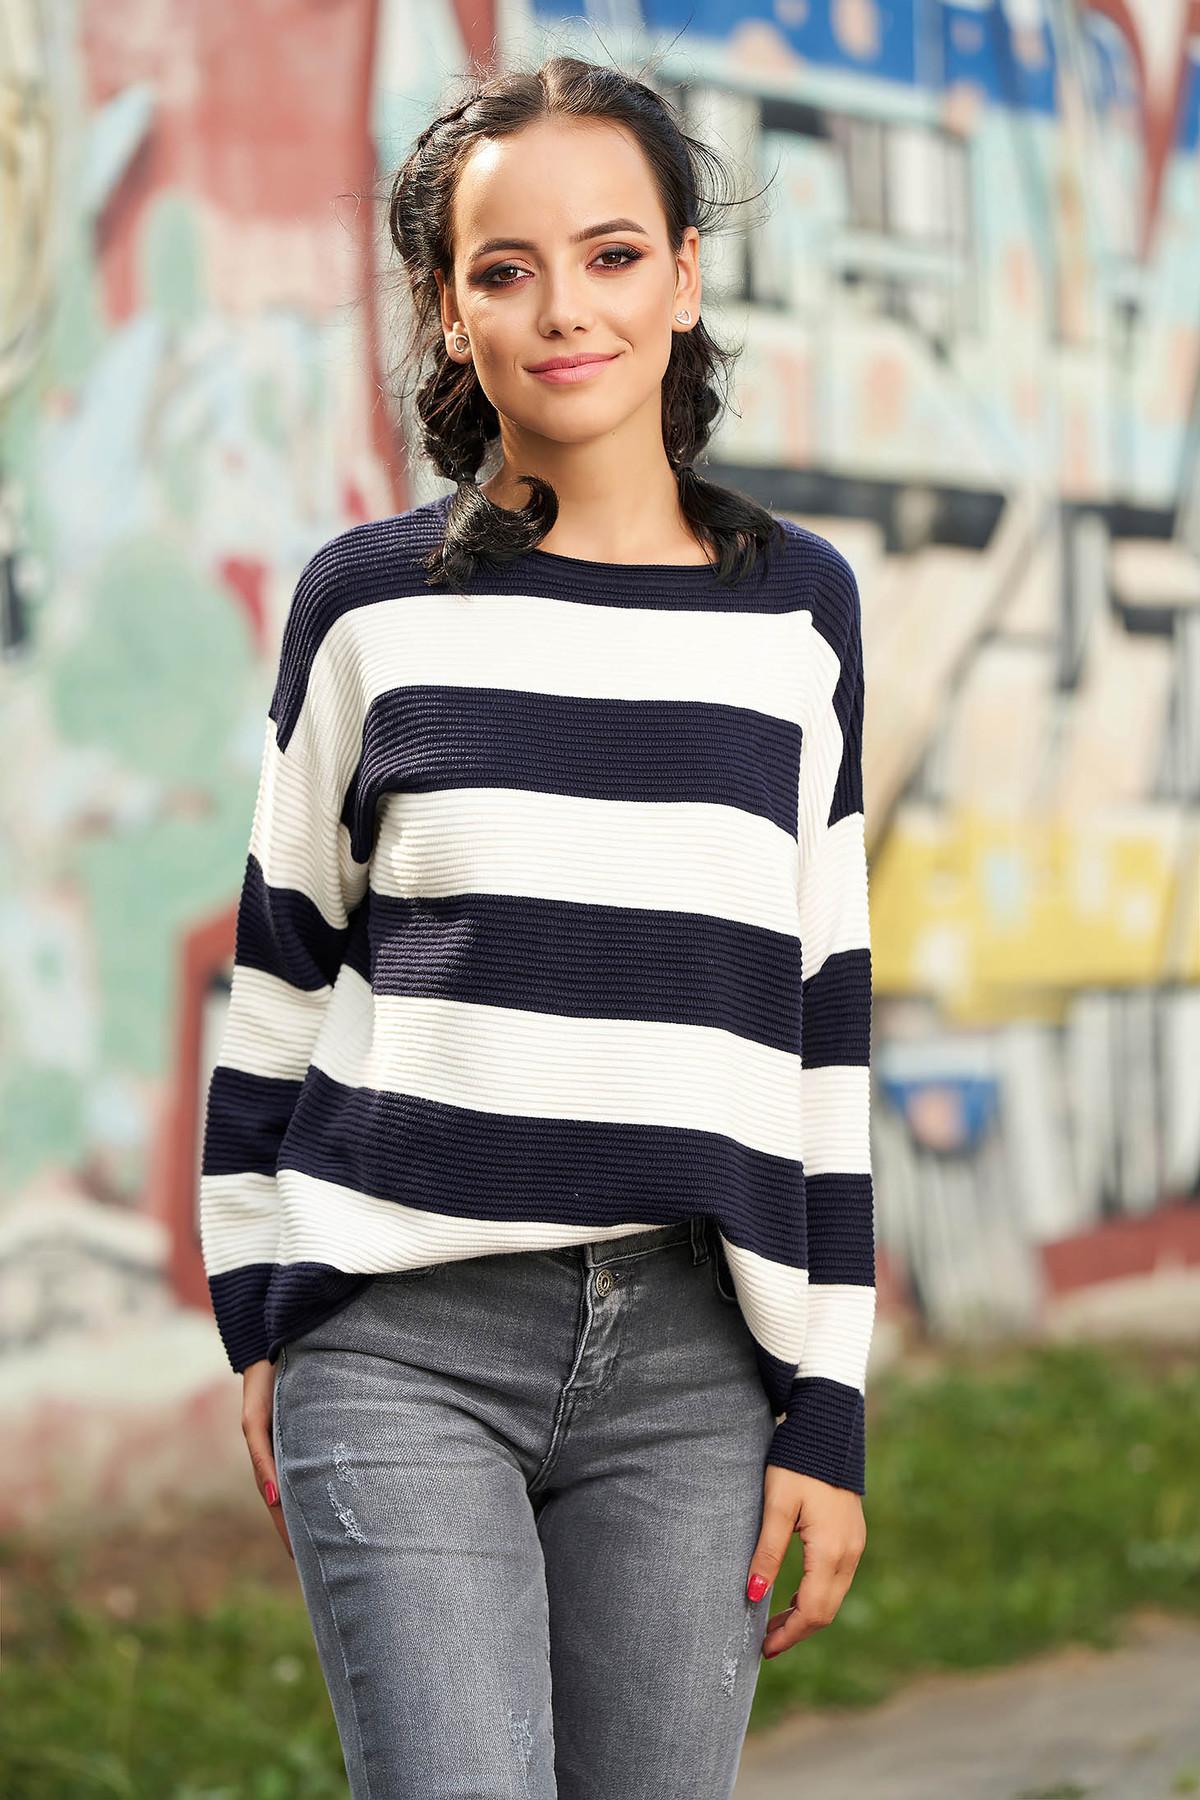 Pulover SunShine albastru-inchis casual tricotat cu croi larg